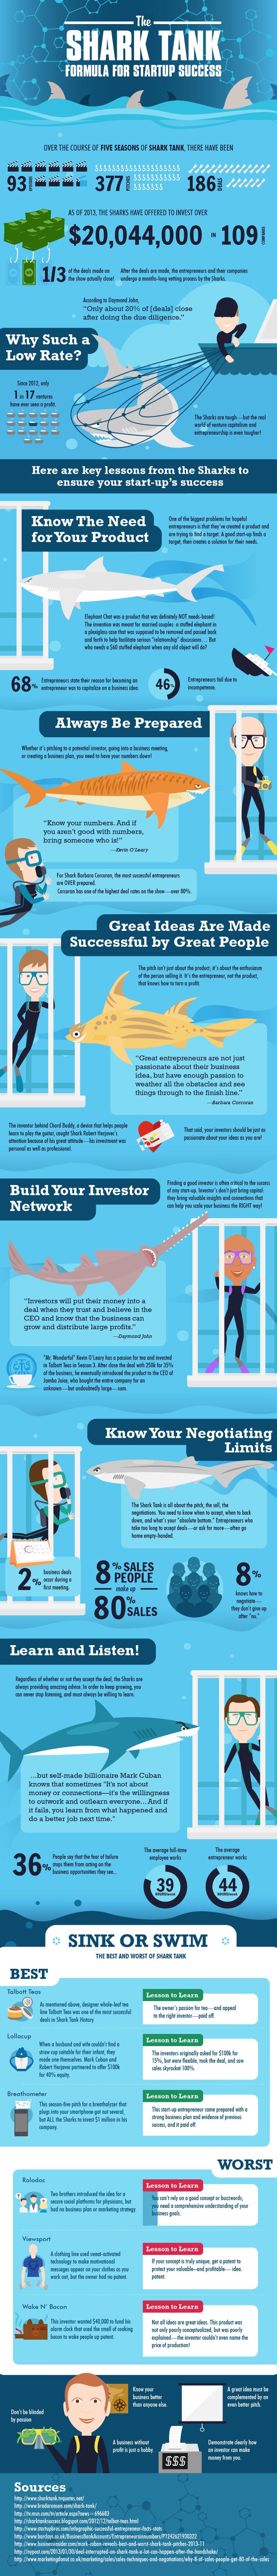 Shark-Tank-Investment